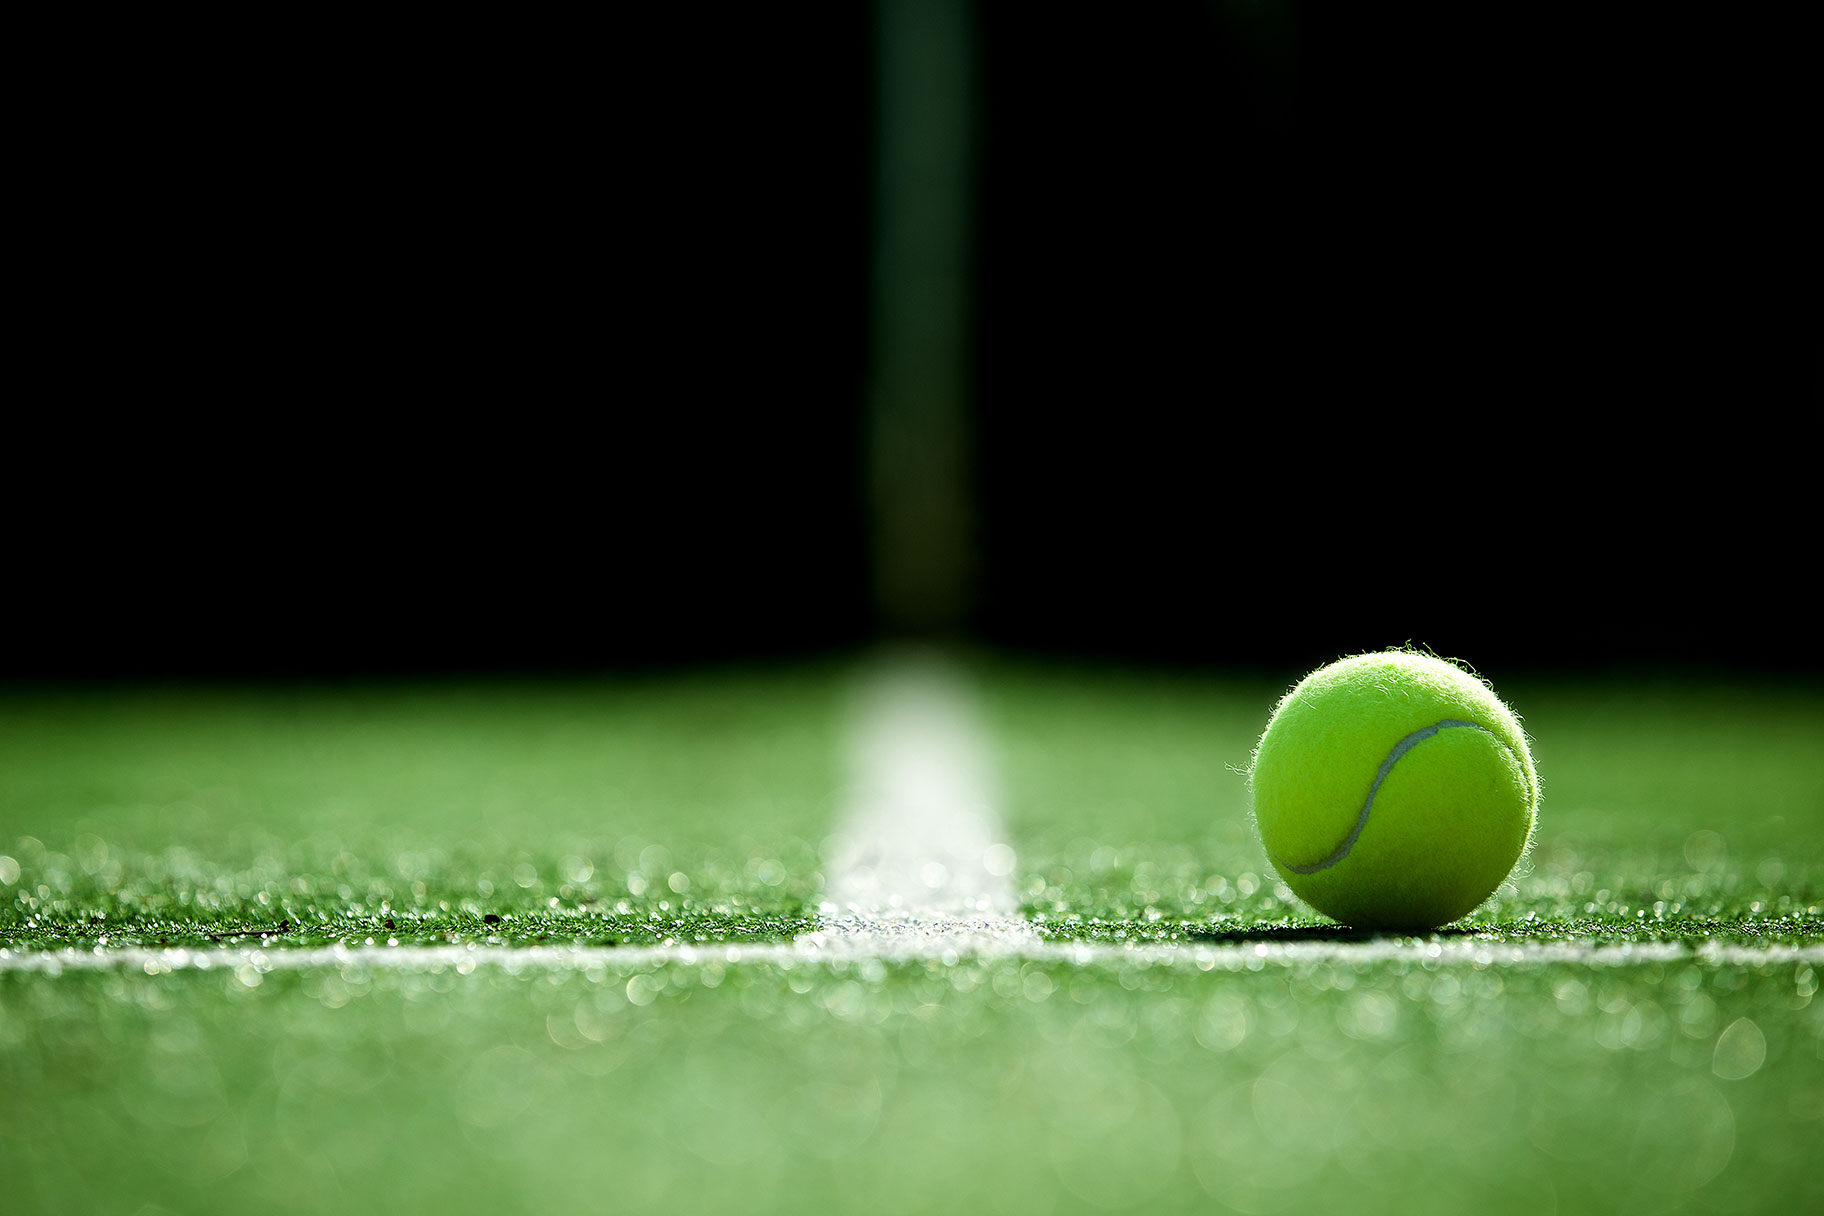 Tennis Lesson 01- The Split Step